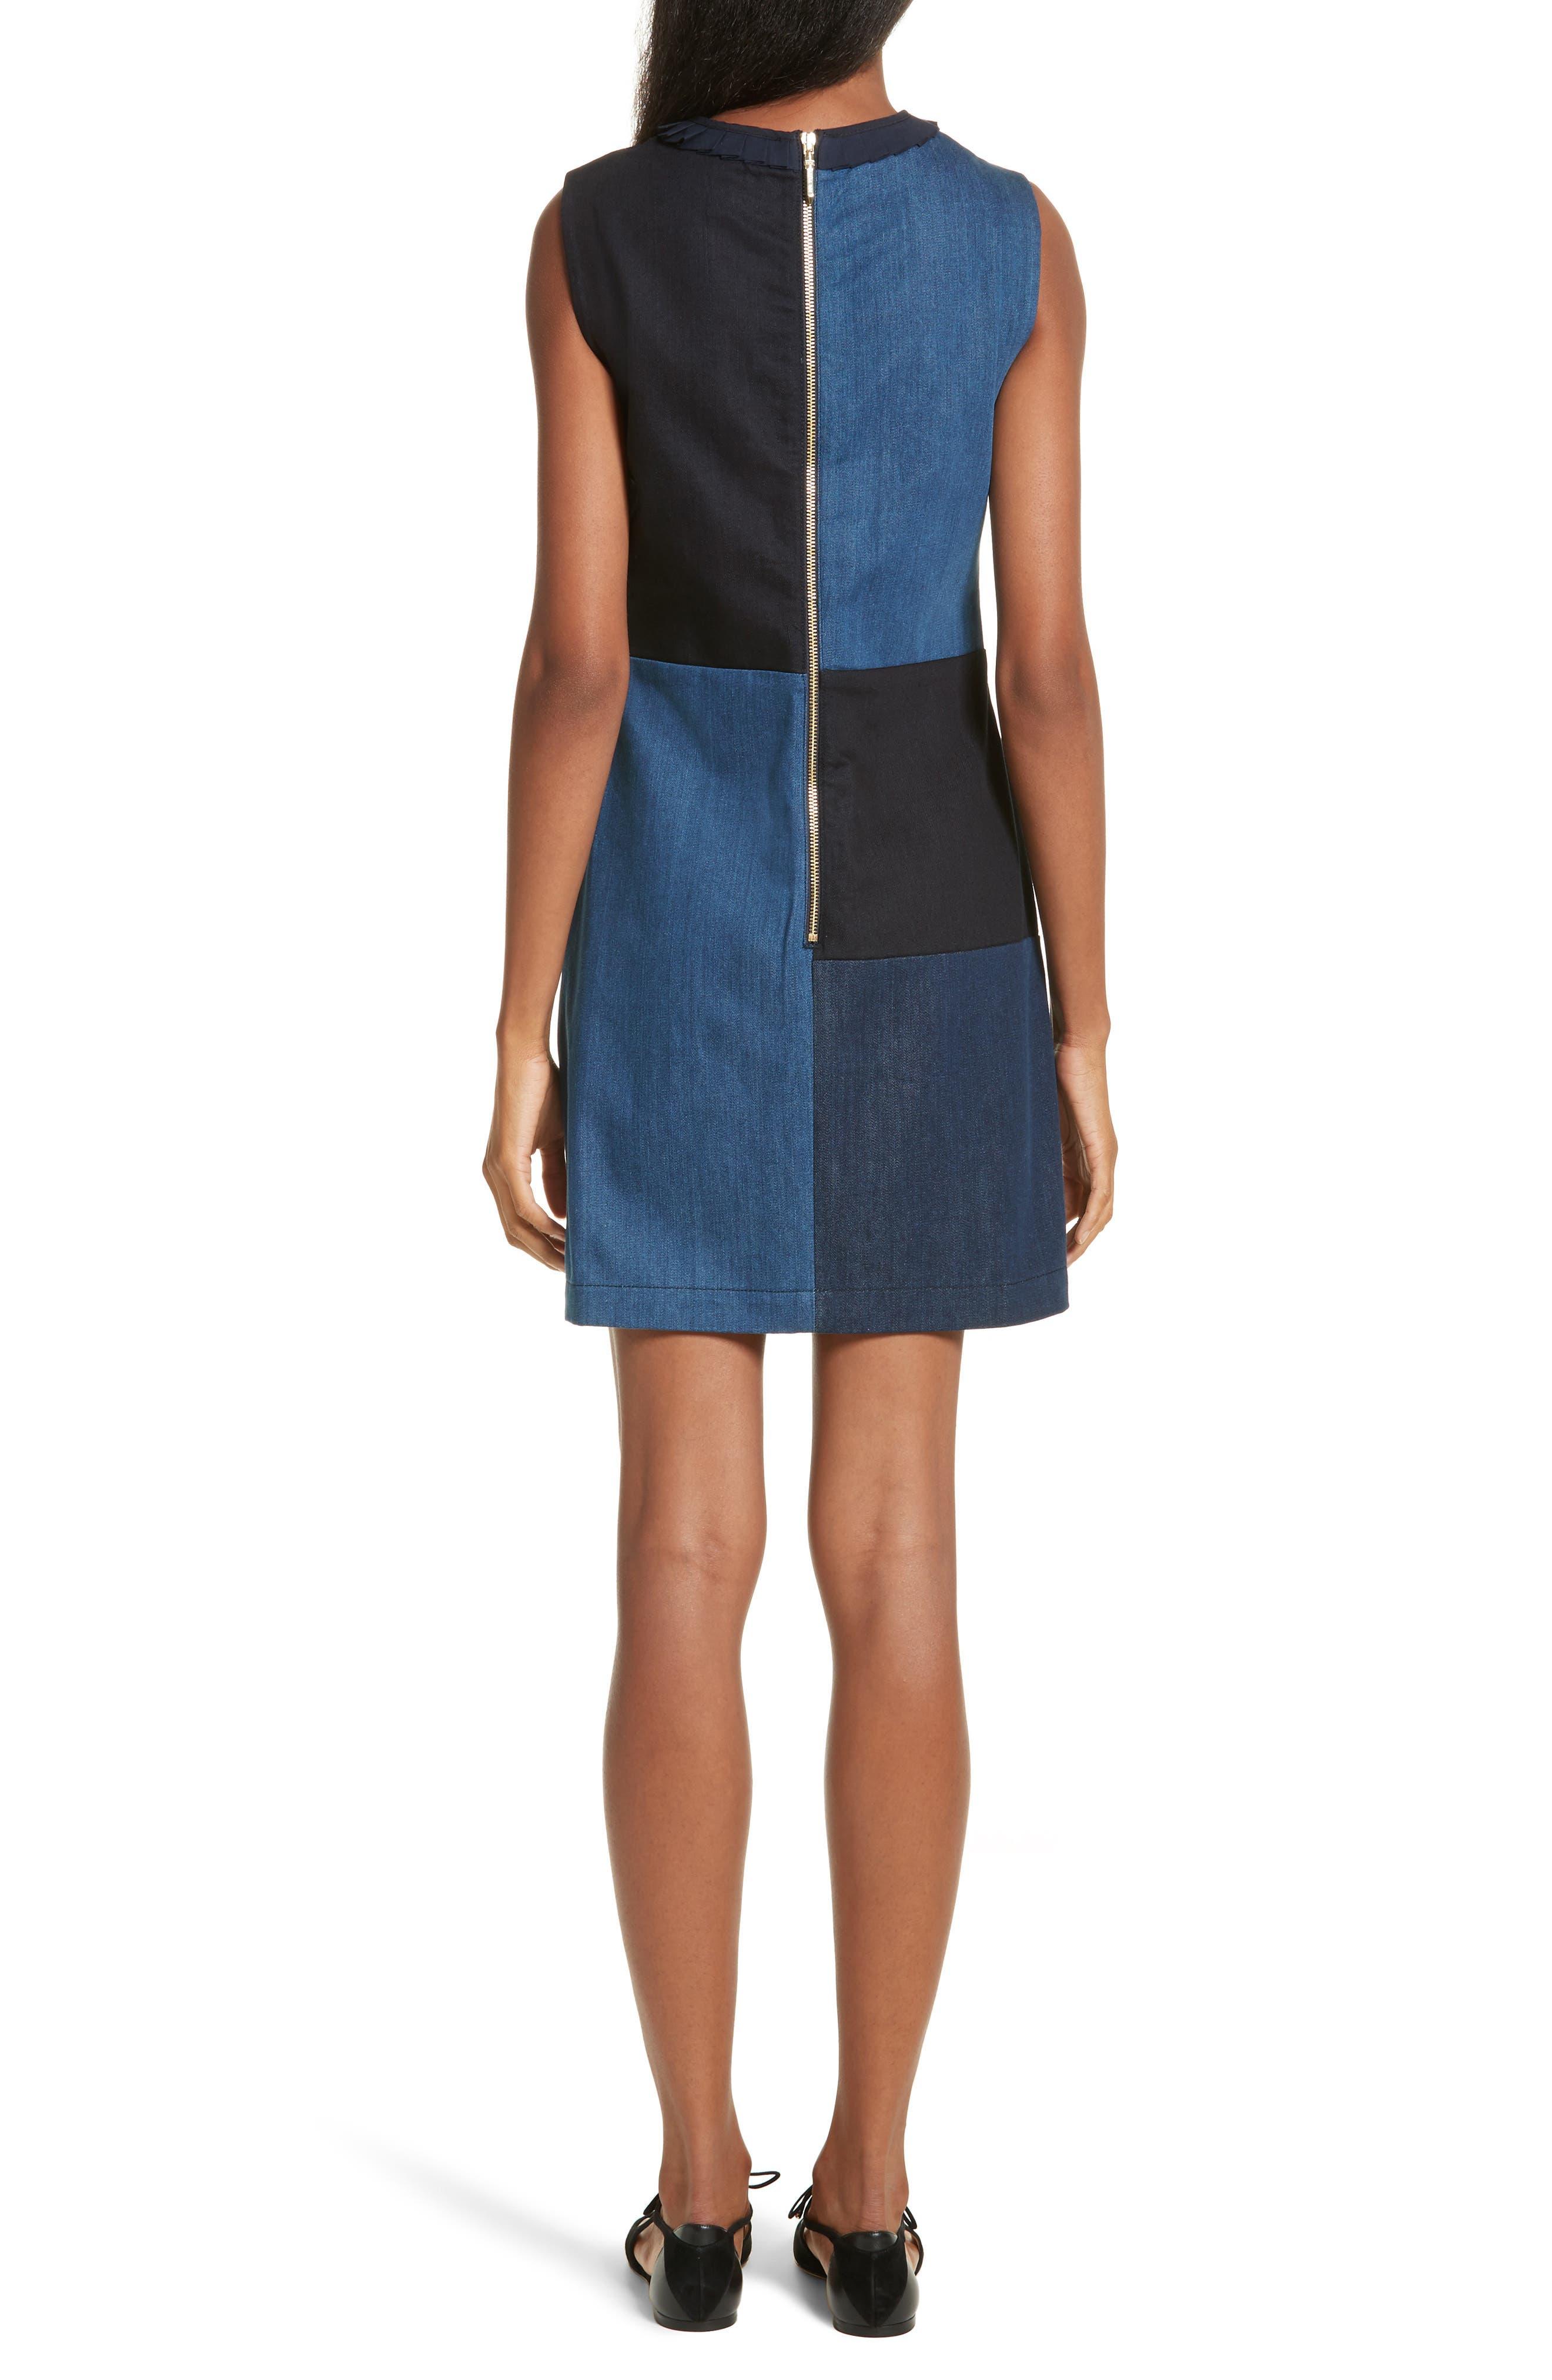 Ted Baker Morfee London Colorblock Denim A-Line Dress,                             Alternate thumbnail 2, color,                             Mid Wash